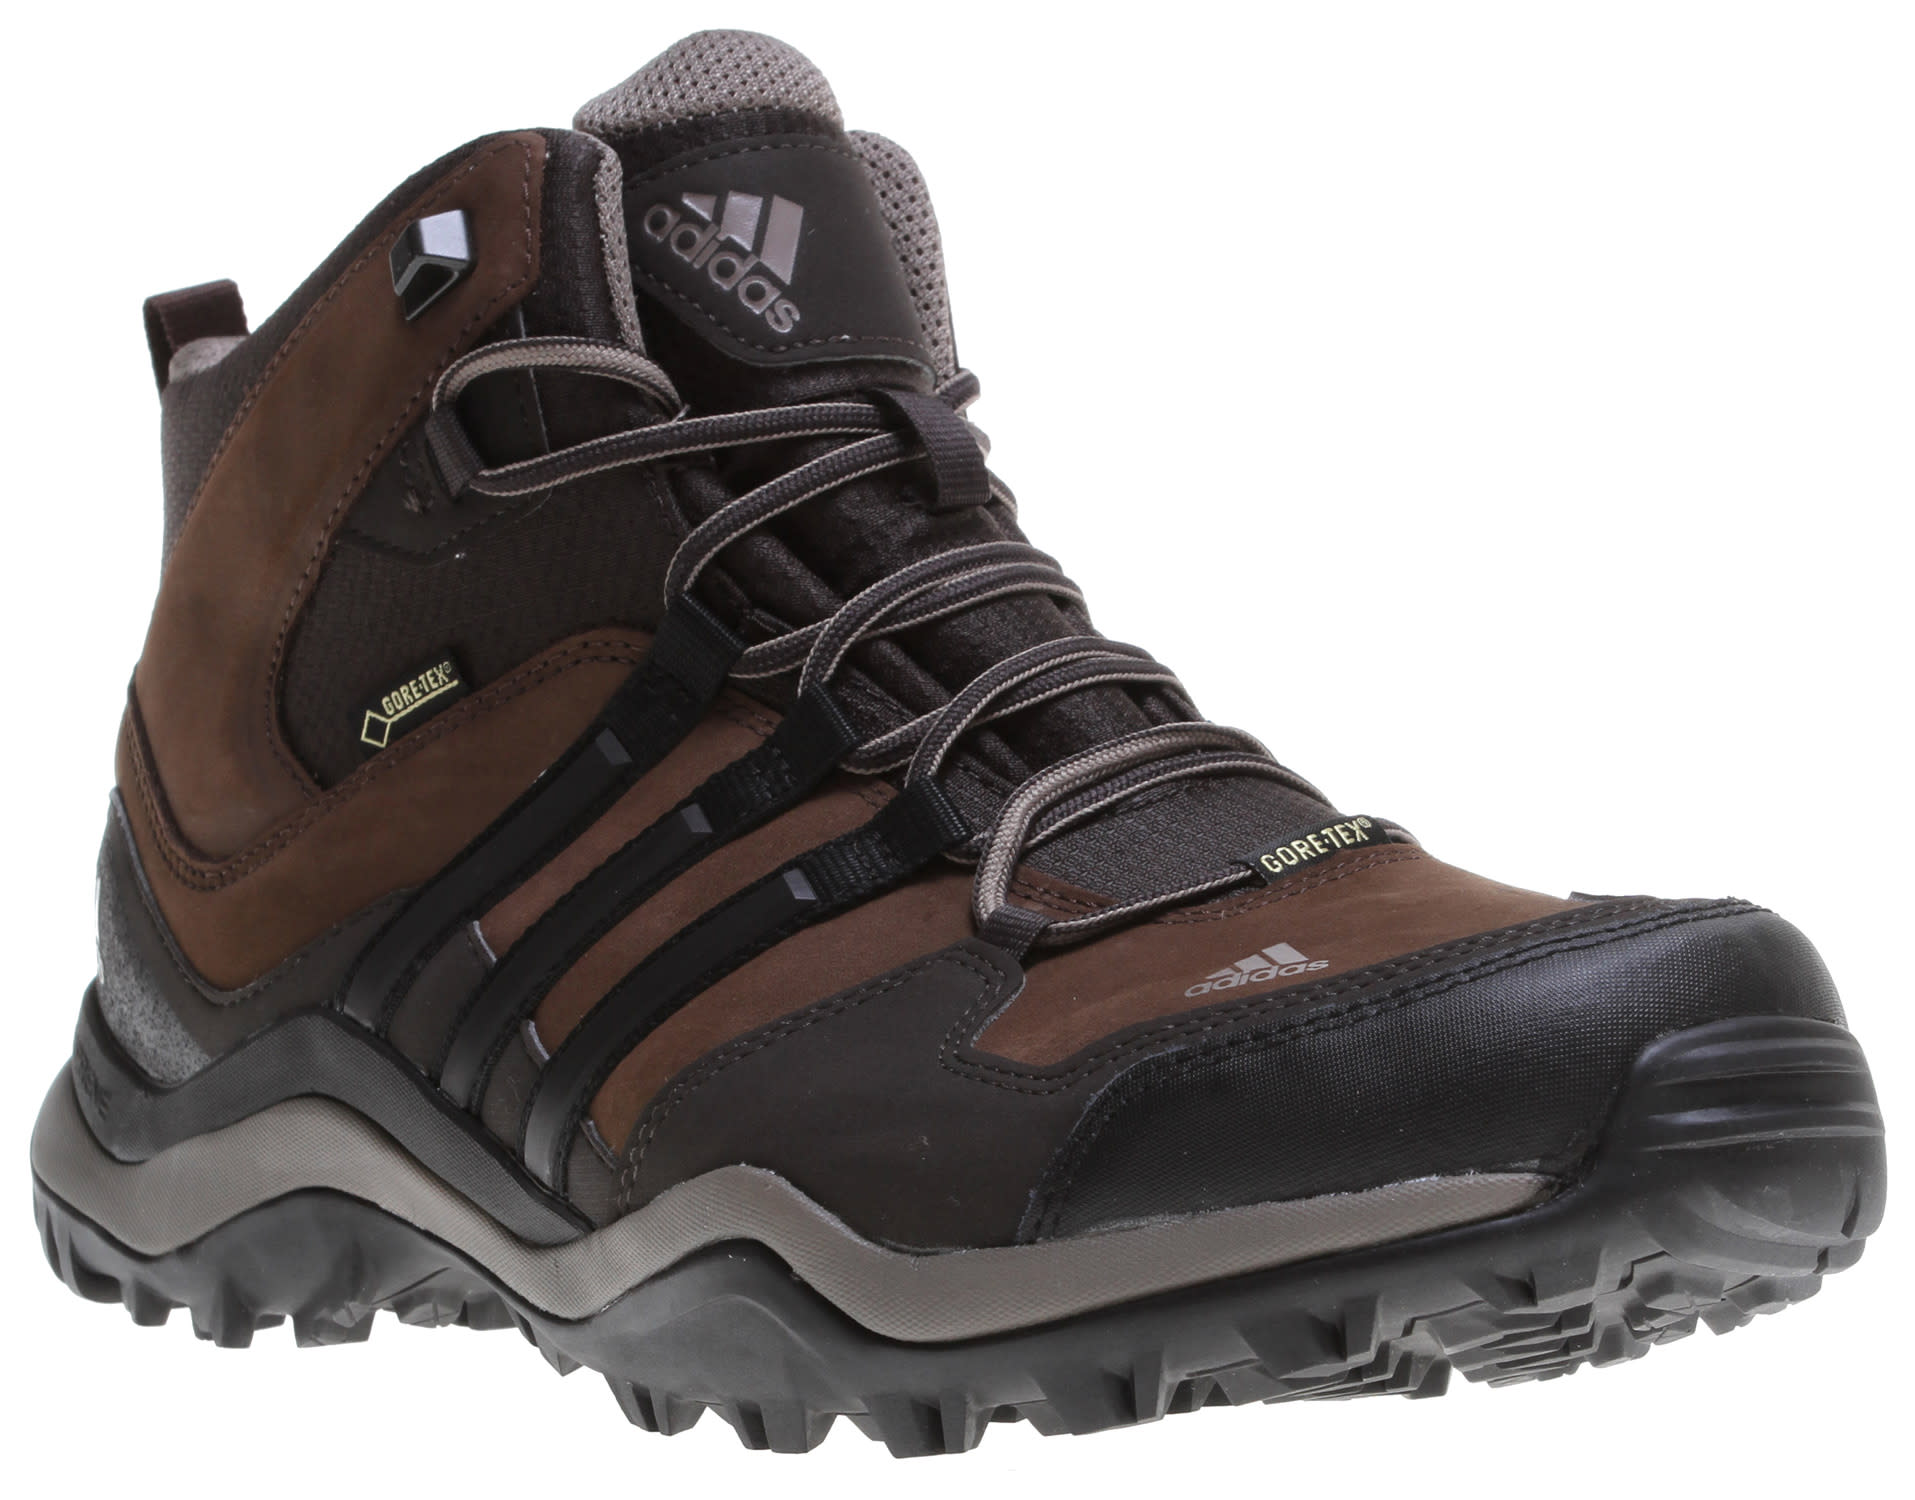 Adidas Kumacross Mid Gtx Leather Hiking Boots